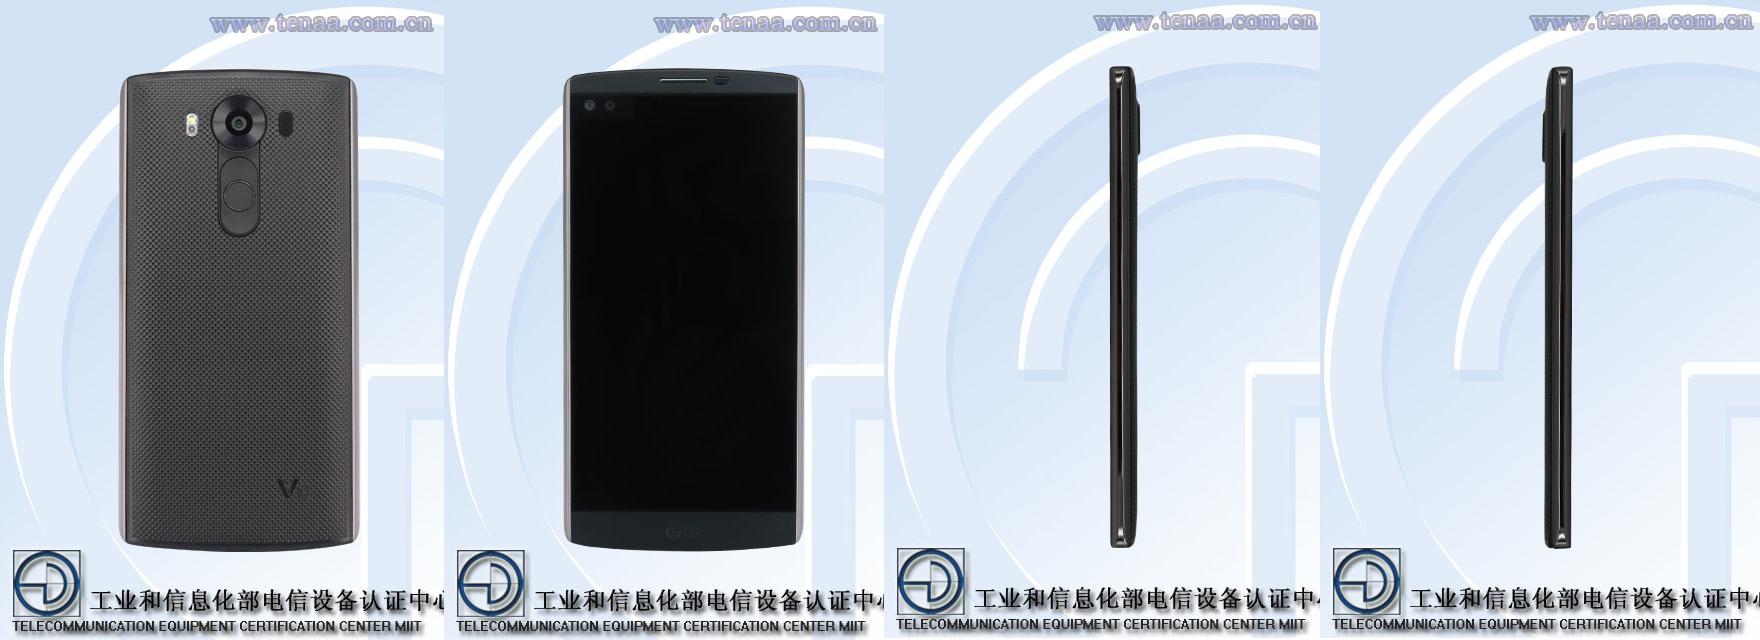 LG G4 Note_Pro imagenes filtradas TENAA